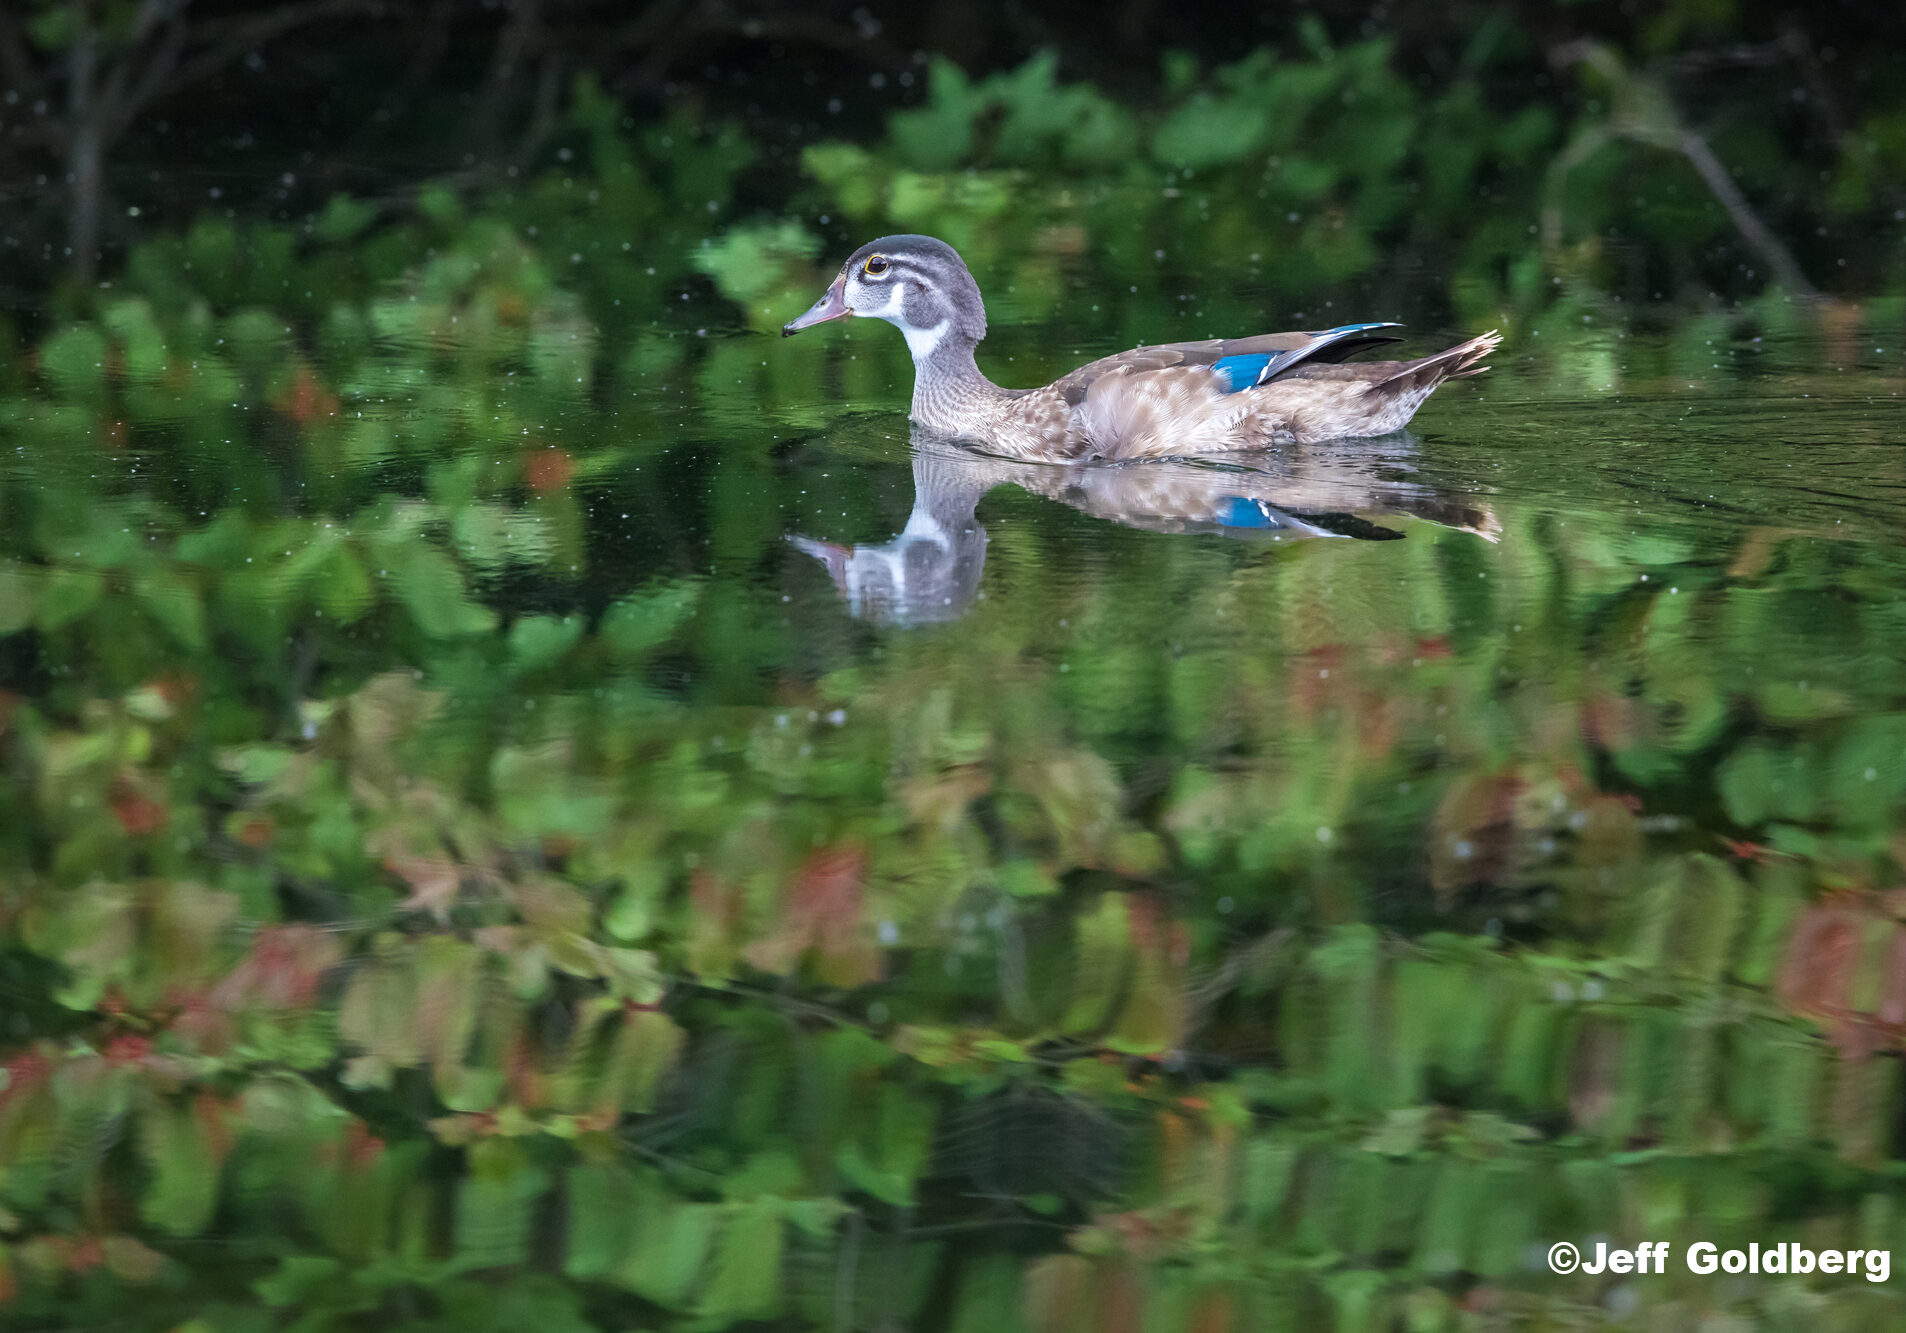 A Mandarin duck swims across a lake